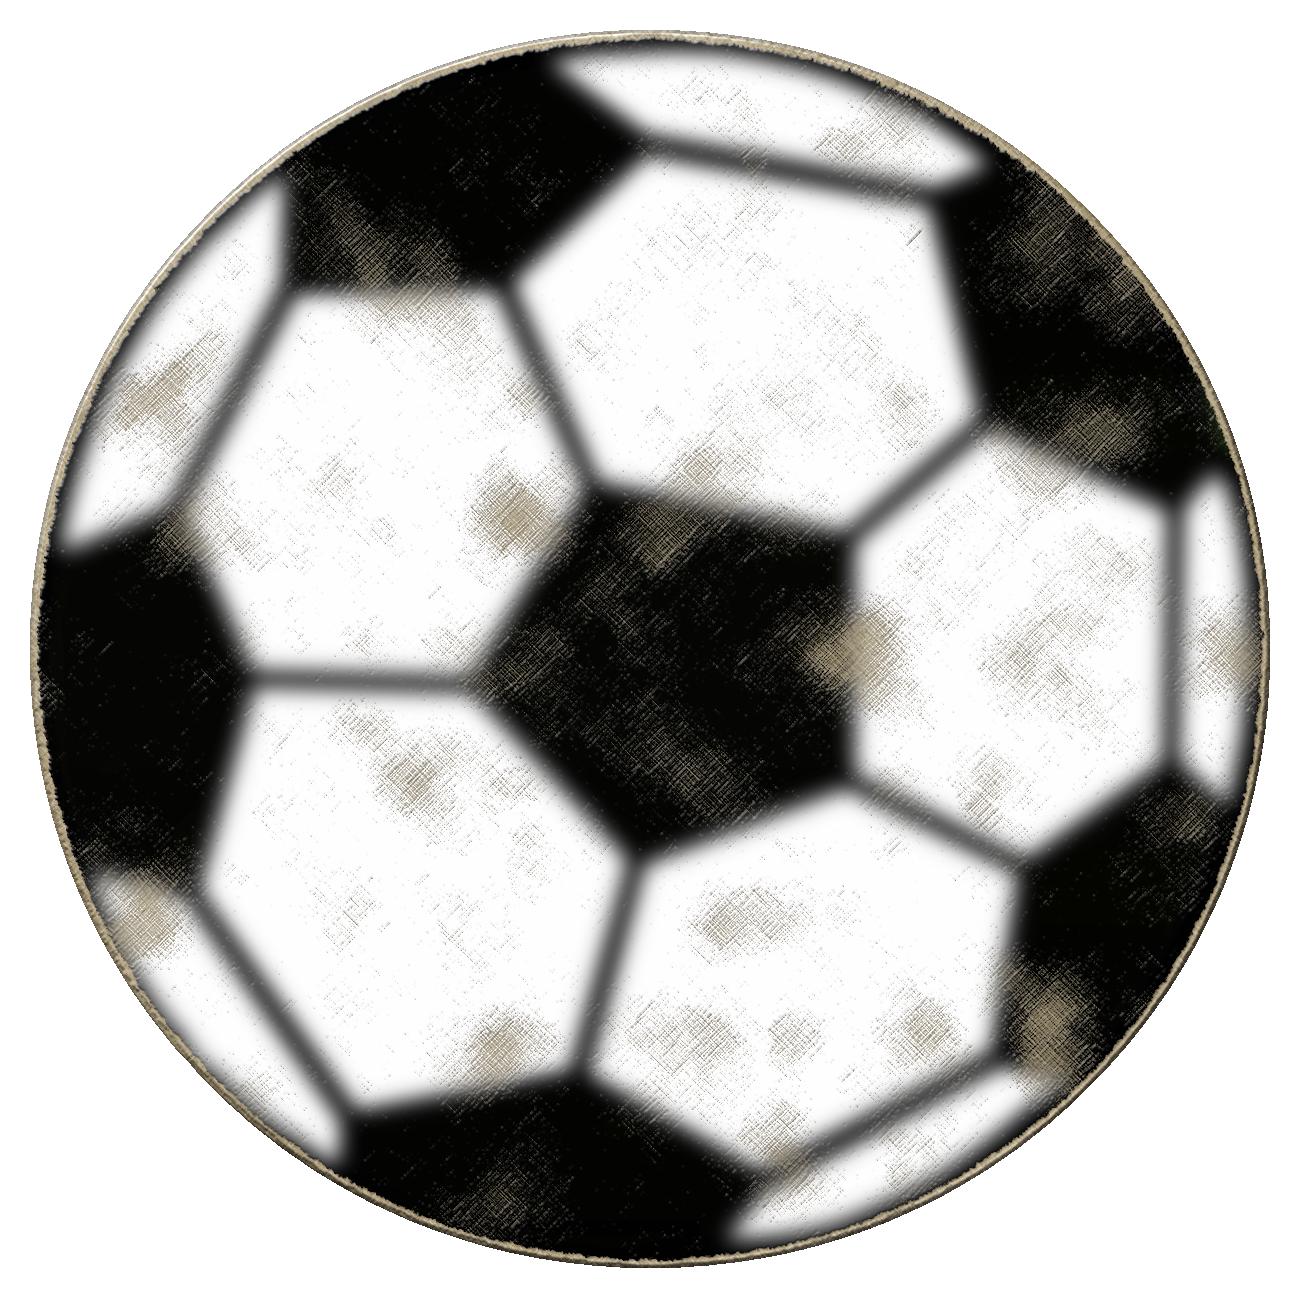 Soccer Ball Concrete Poem 86